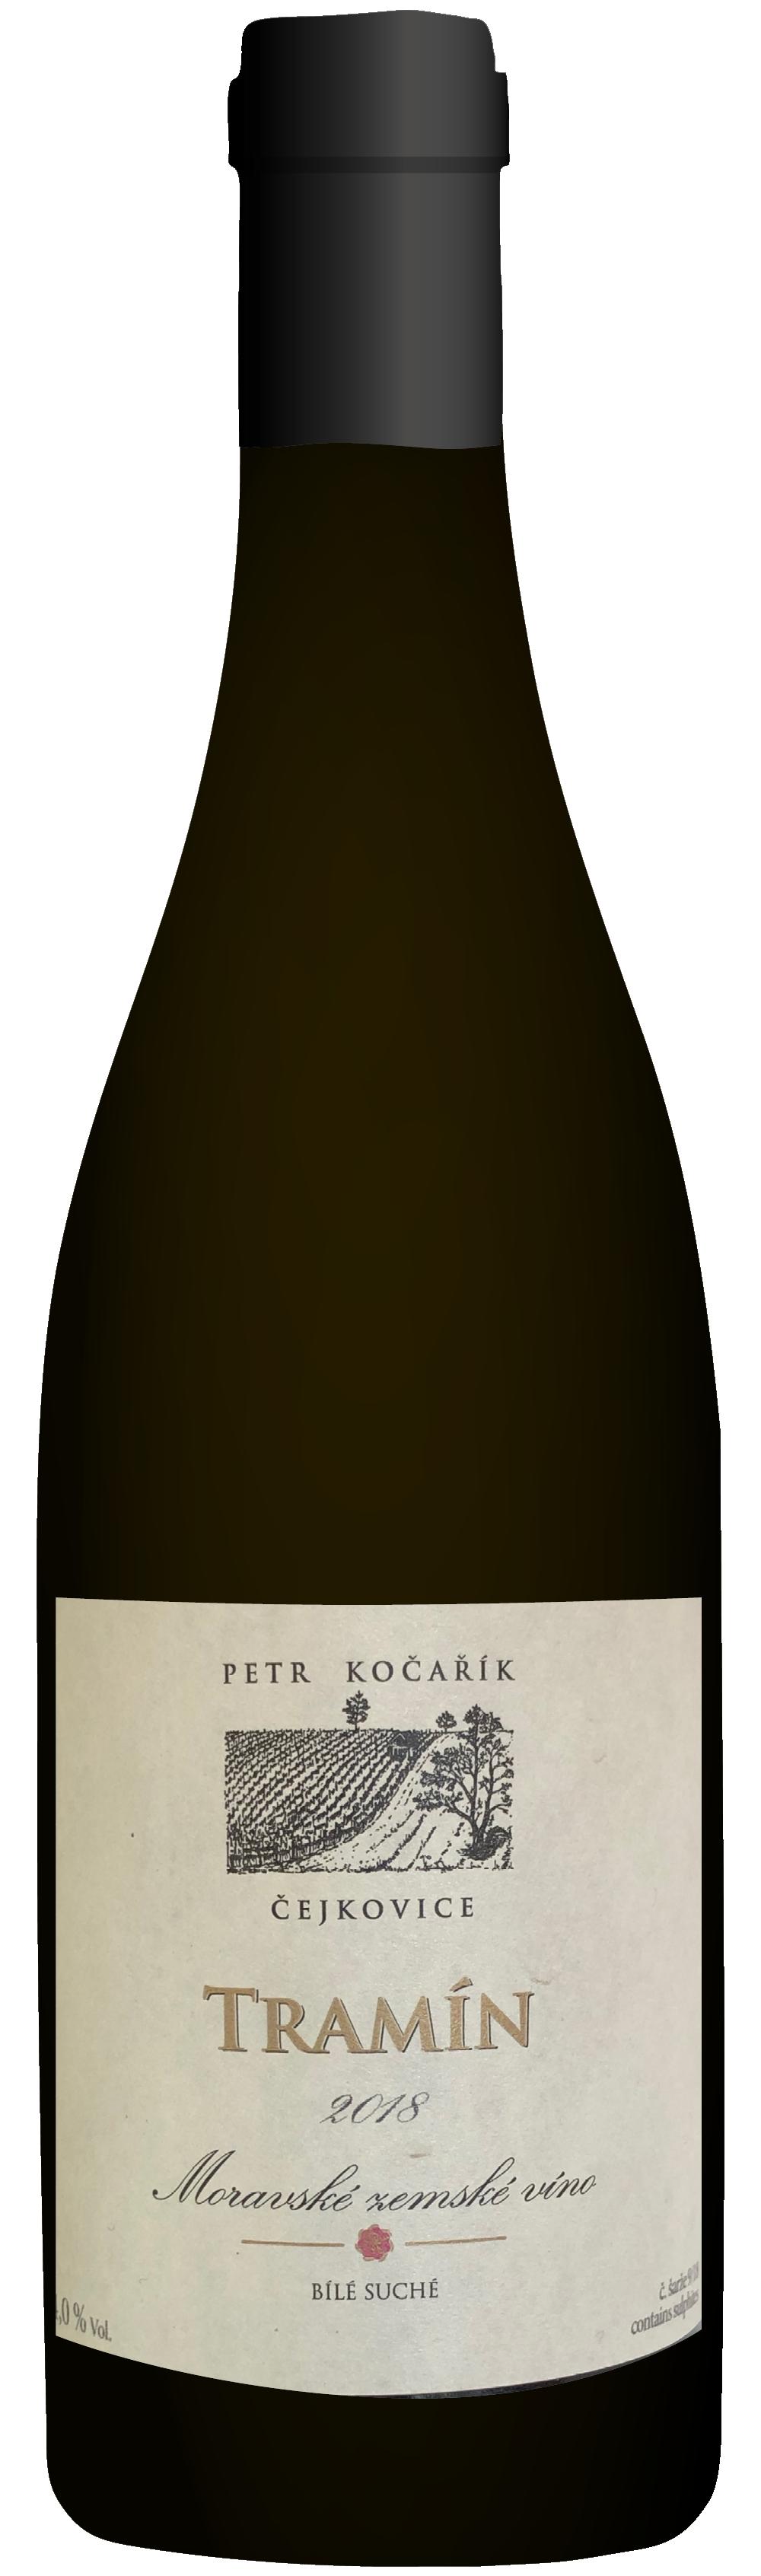 the natural wine company club february 2021 czech republic petr kocarik tramin